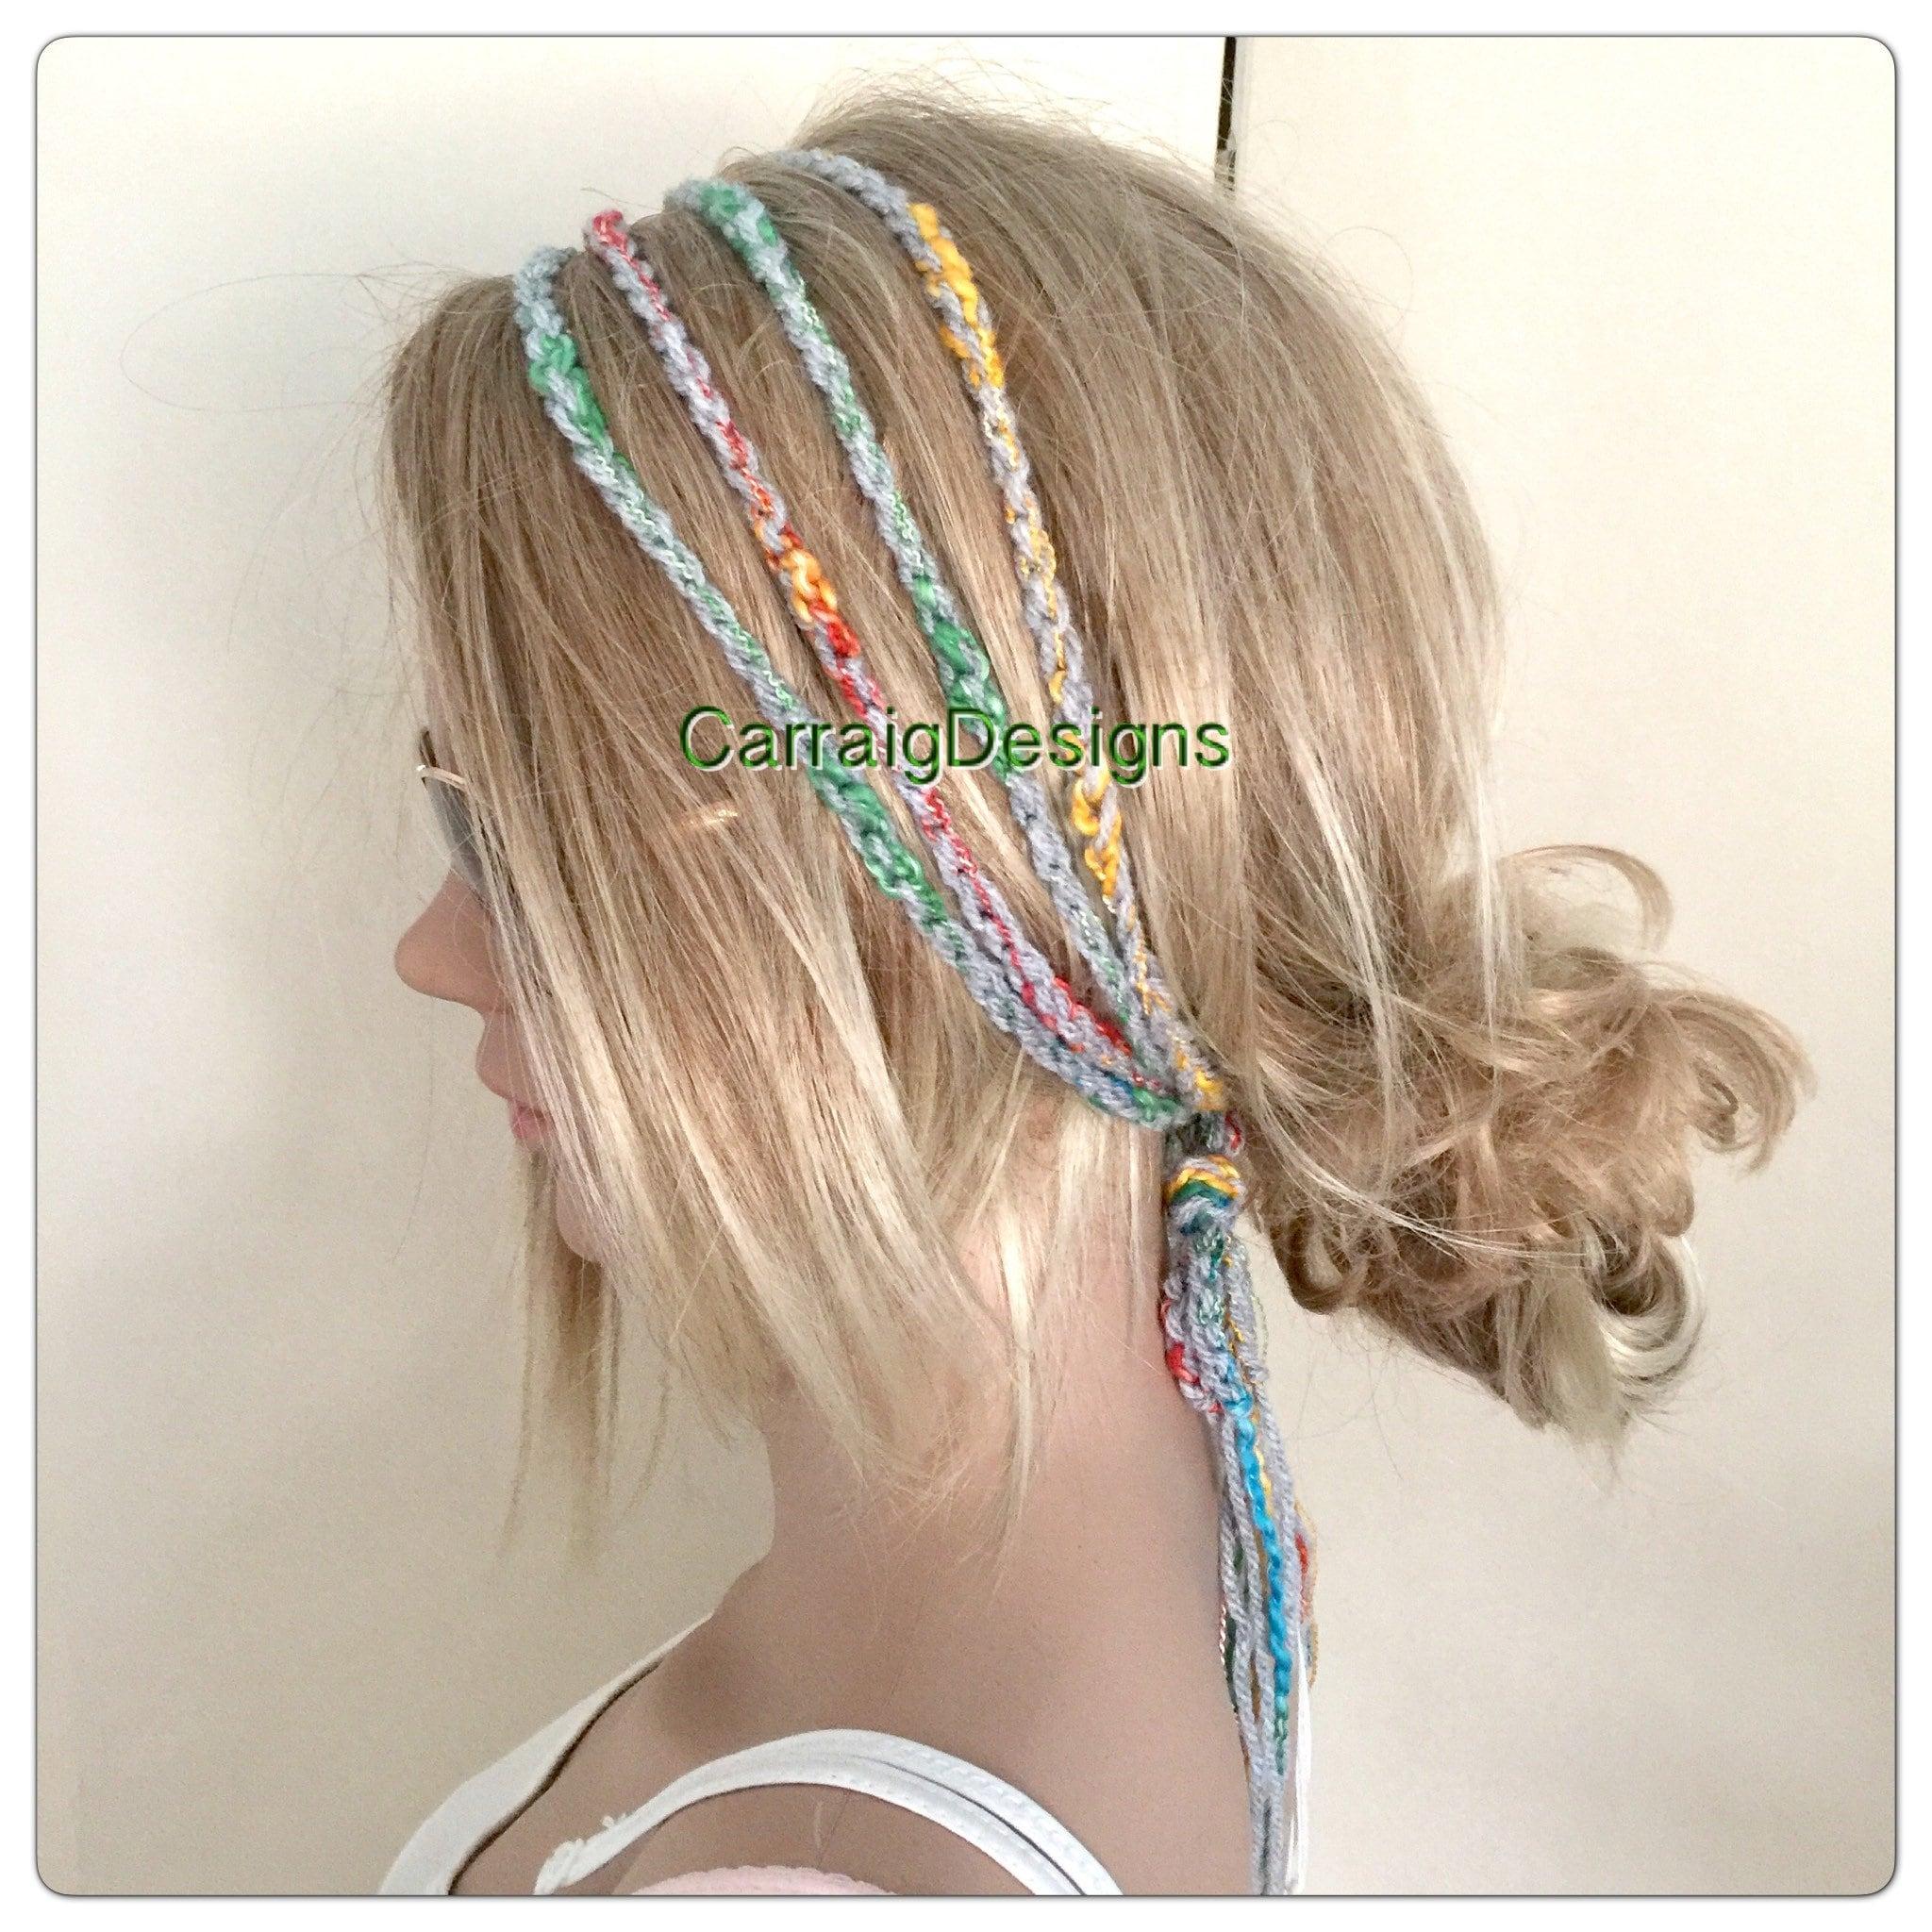 Rasta headband Womens Gypsy Hairband Hair Wrap Designer dread womens teens  yoga hand knit crochet chain grey rainbow tube hippy hippie boho ee46c8d9dd0